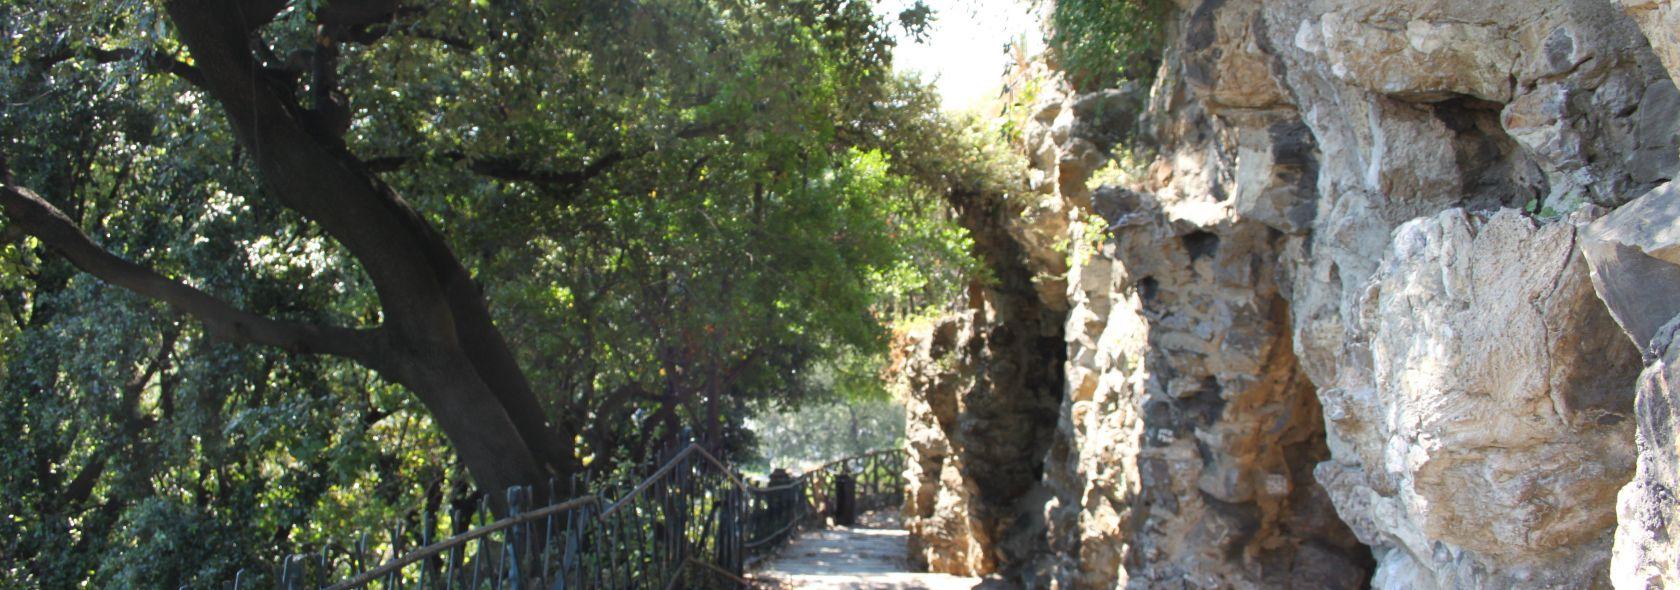 Villetta di Negro - grotteschi